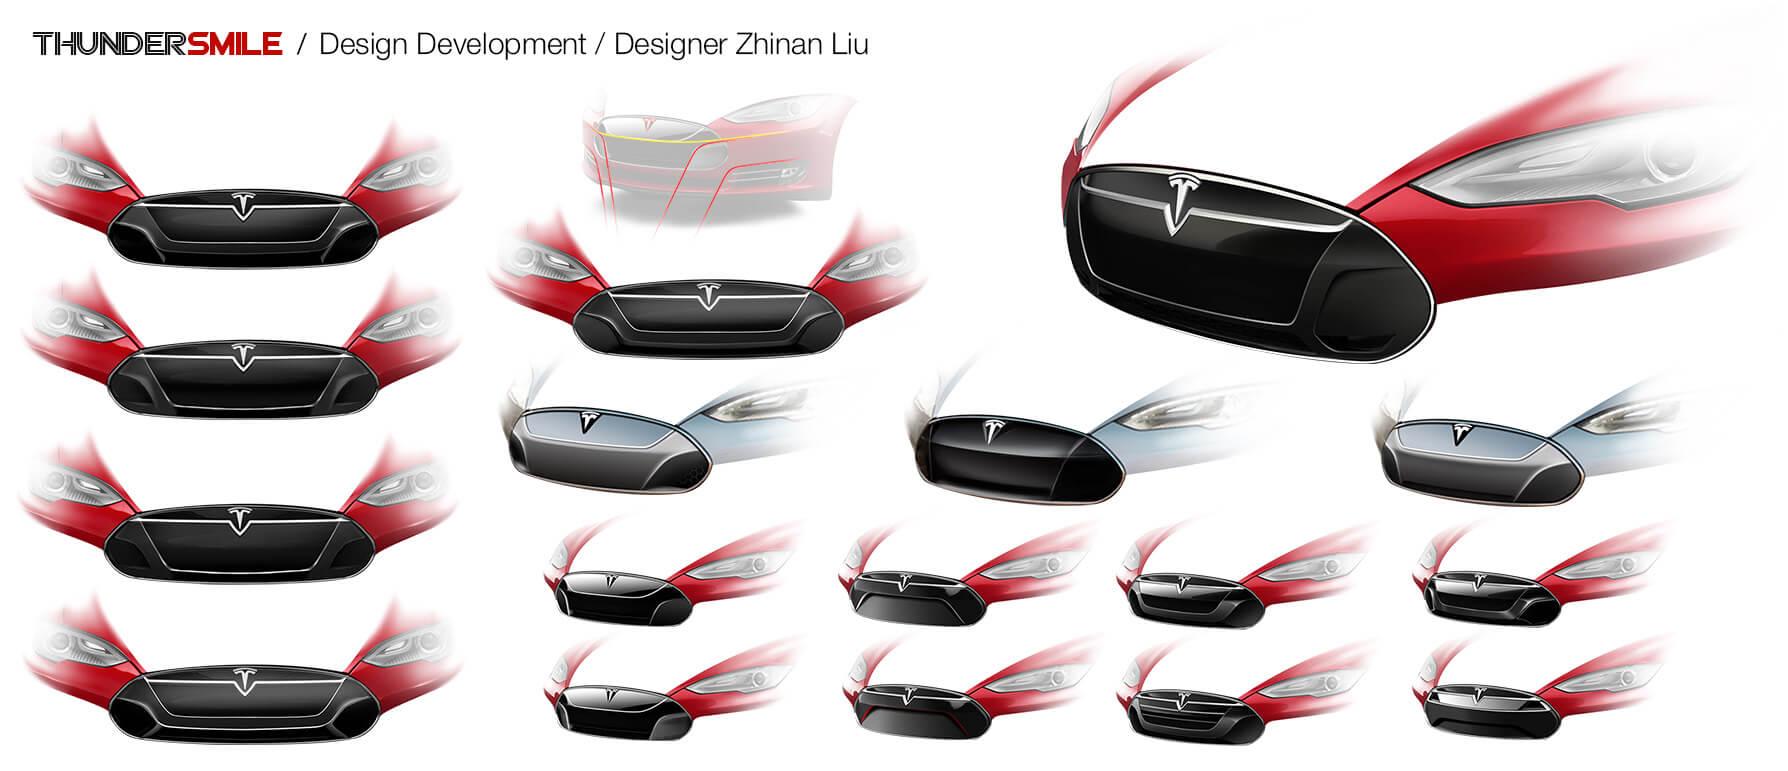 thundersmile-design-development-zhinan